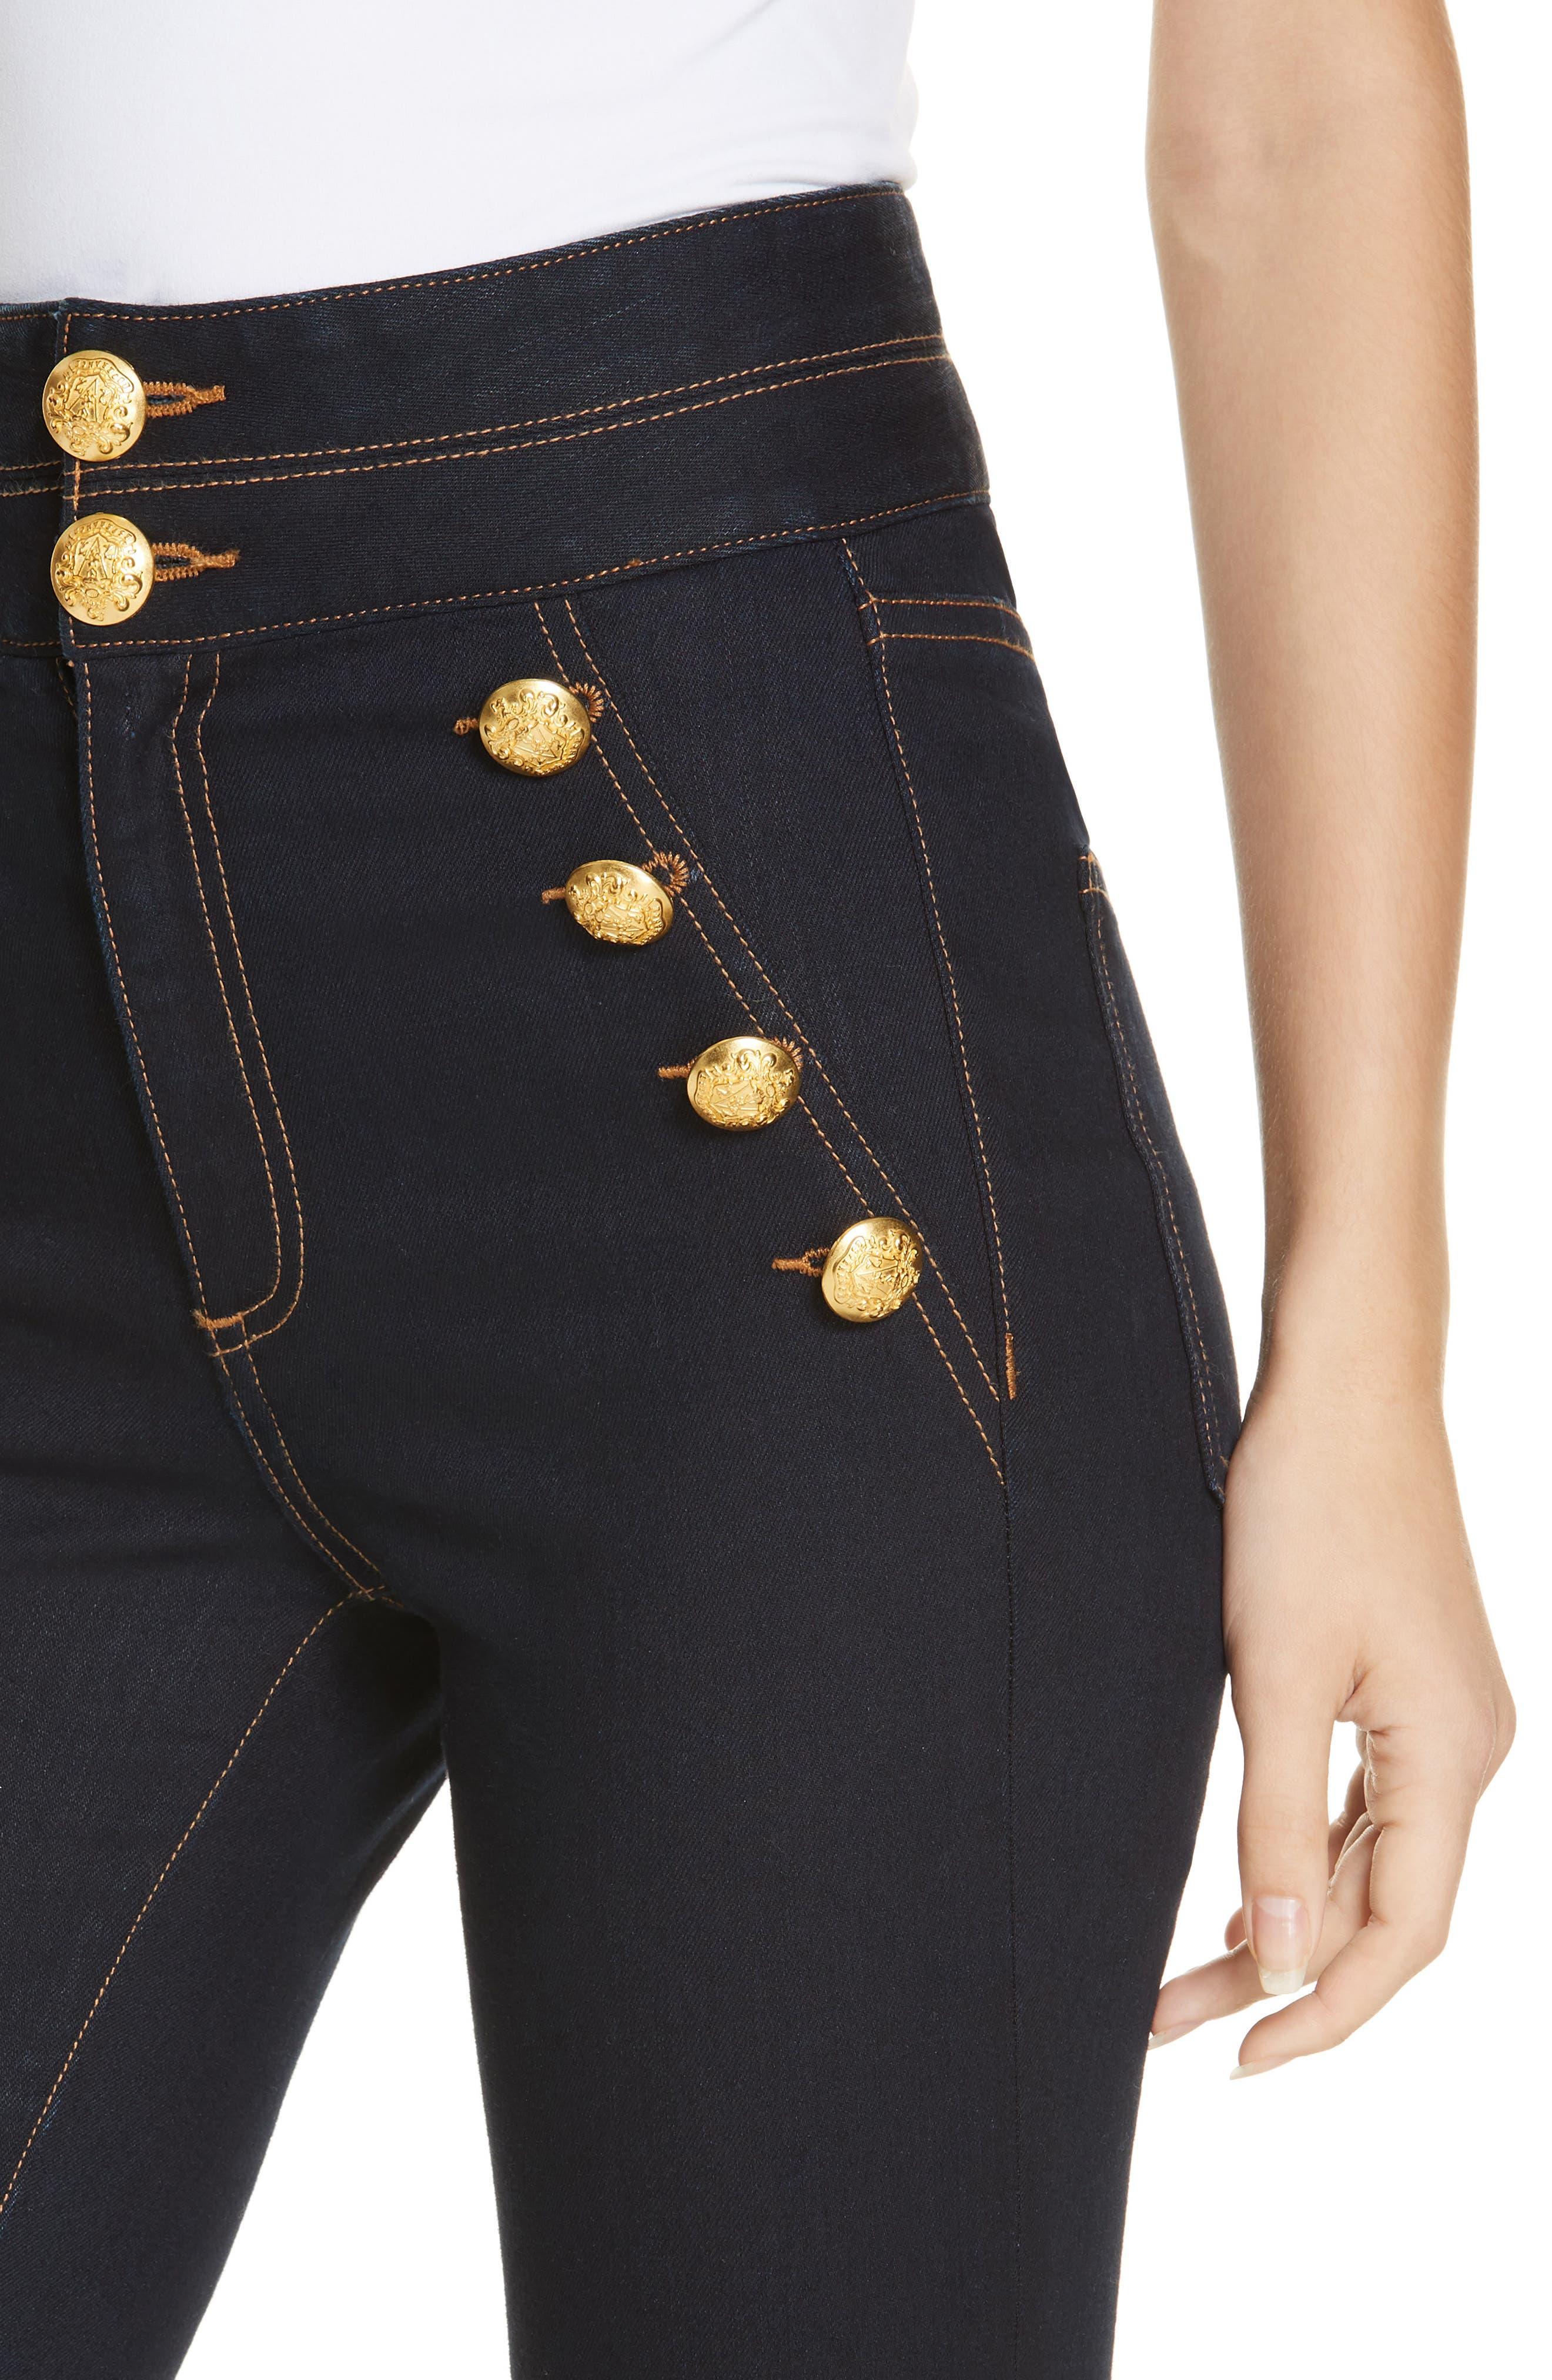 VERONICA BEARD, Dalida Button Detail Skinny Flare Jeans, Alternate thumbnail 4, color, INDIGO